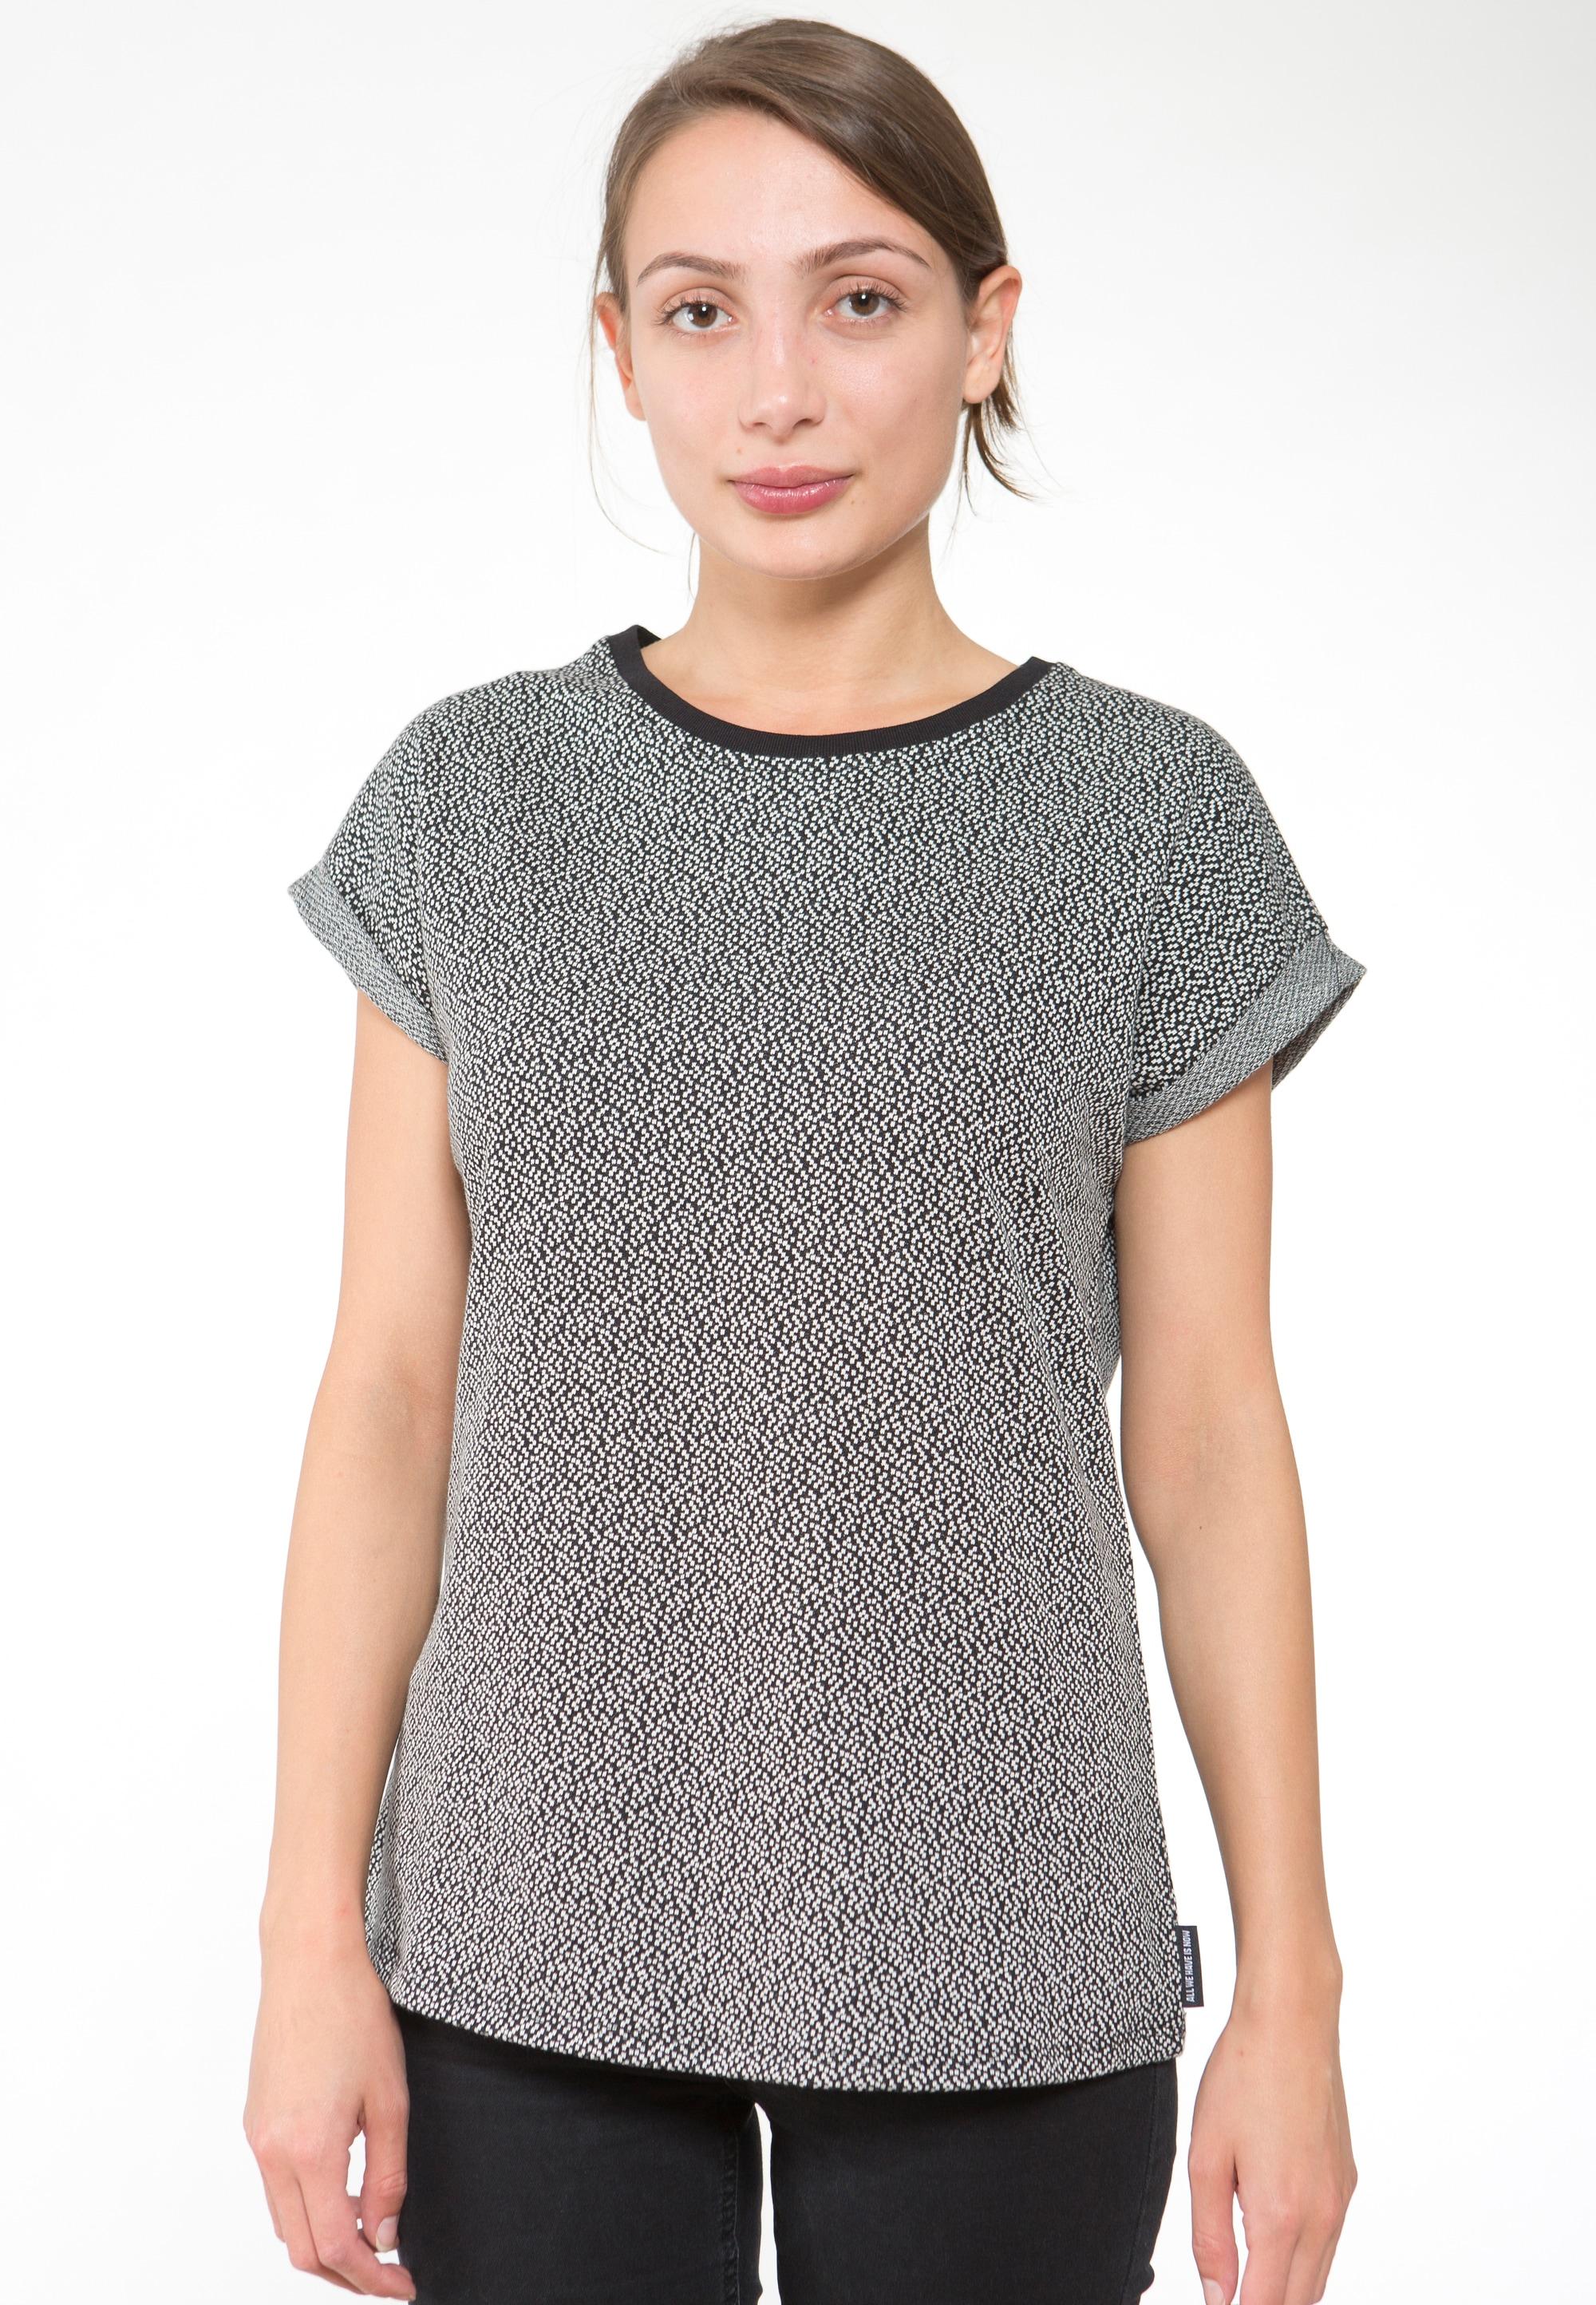 Ezekiel T-Shirt mit textilem Muster | Bekleidung > Shirts > T-Shirts | Ezekiel